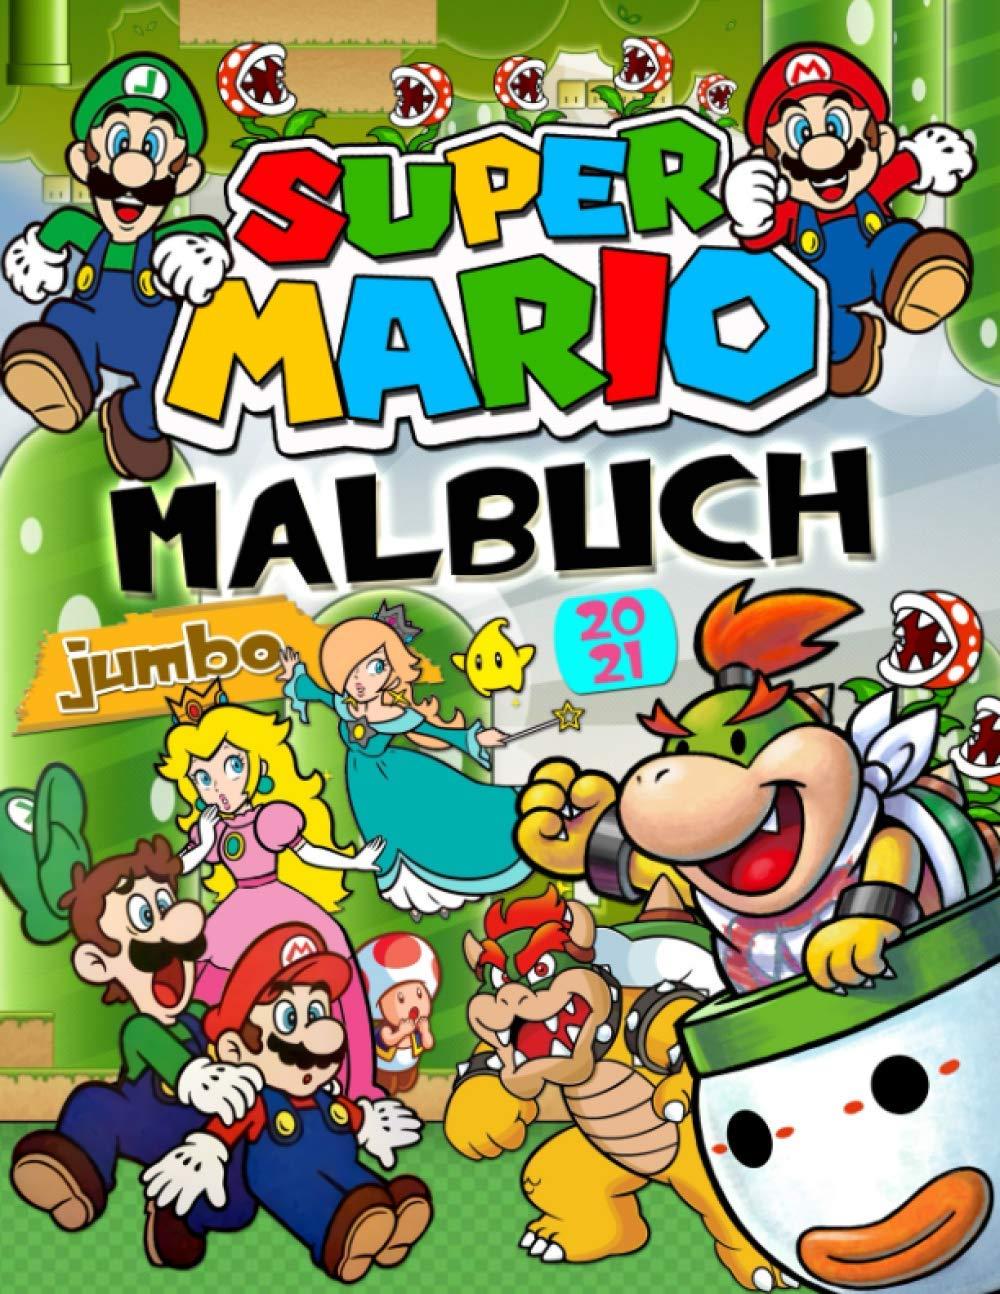 Super Mario Malbuch: Großartiges Super Mario Bros. Malbuch Mit